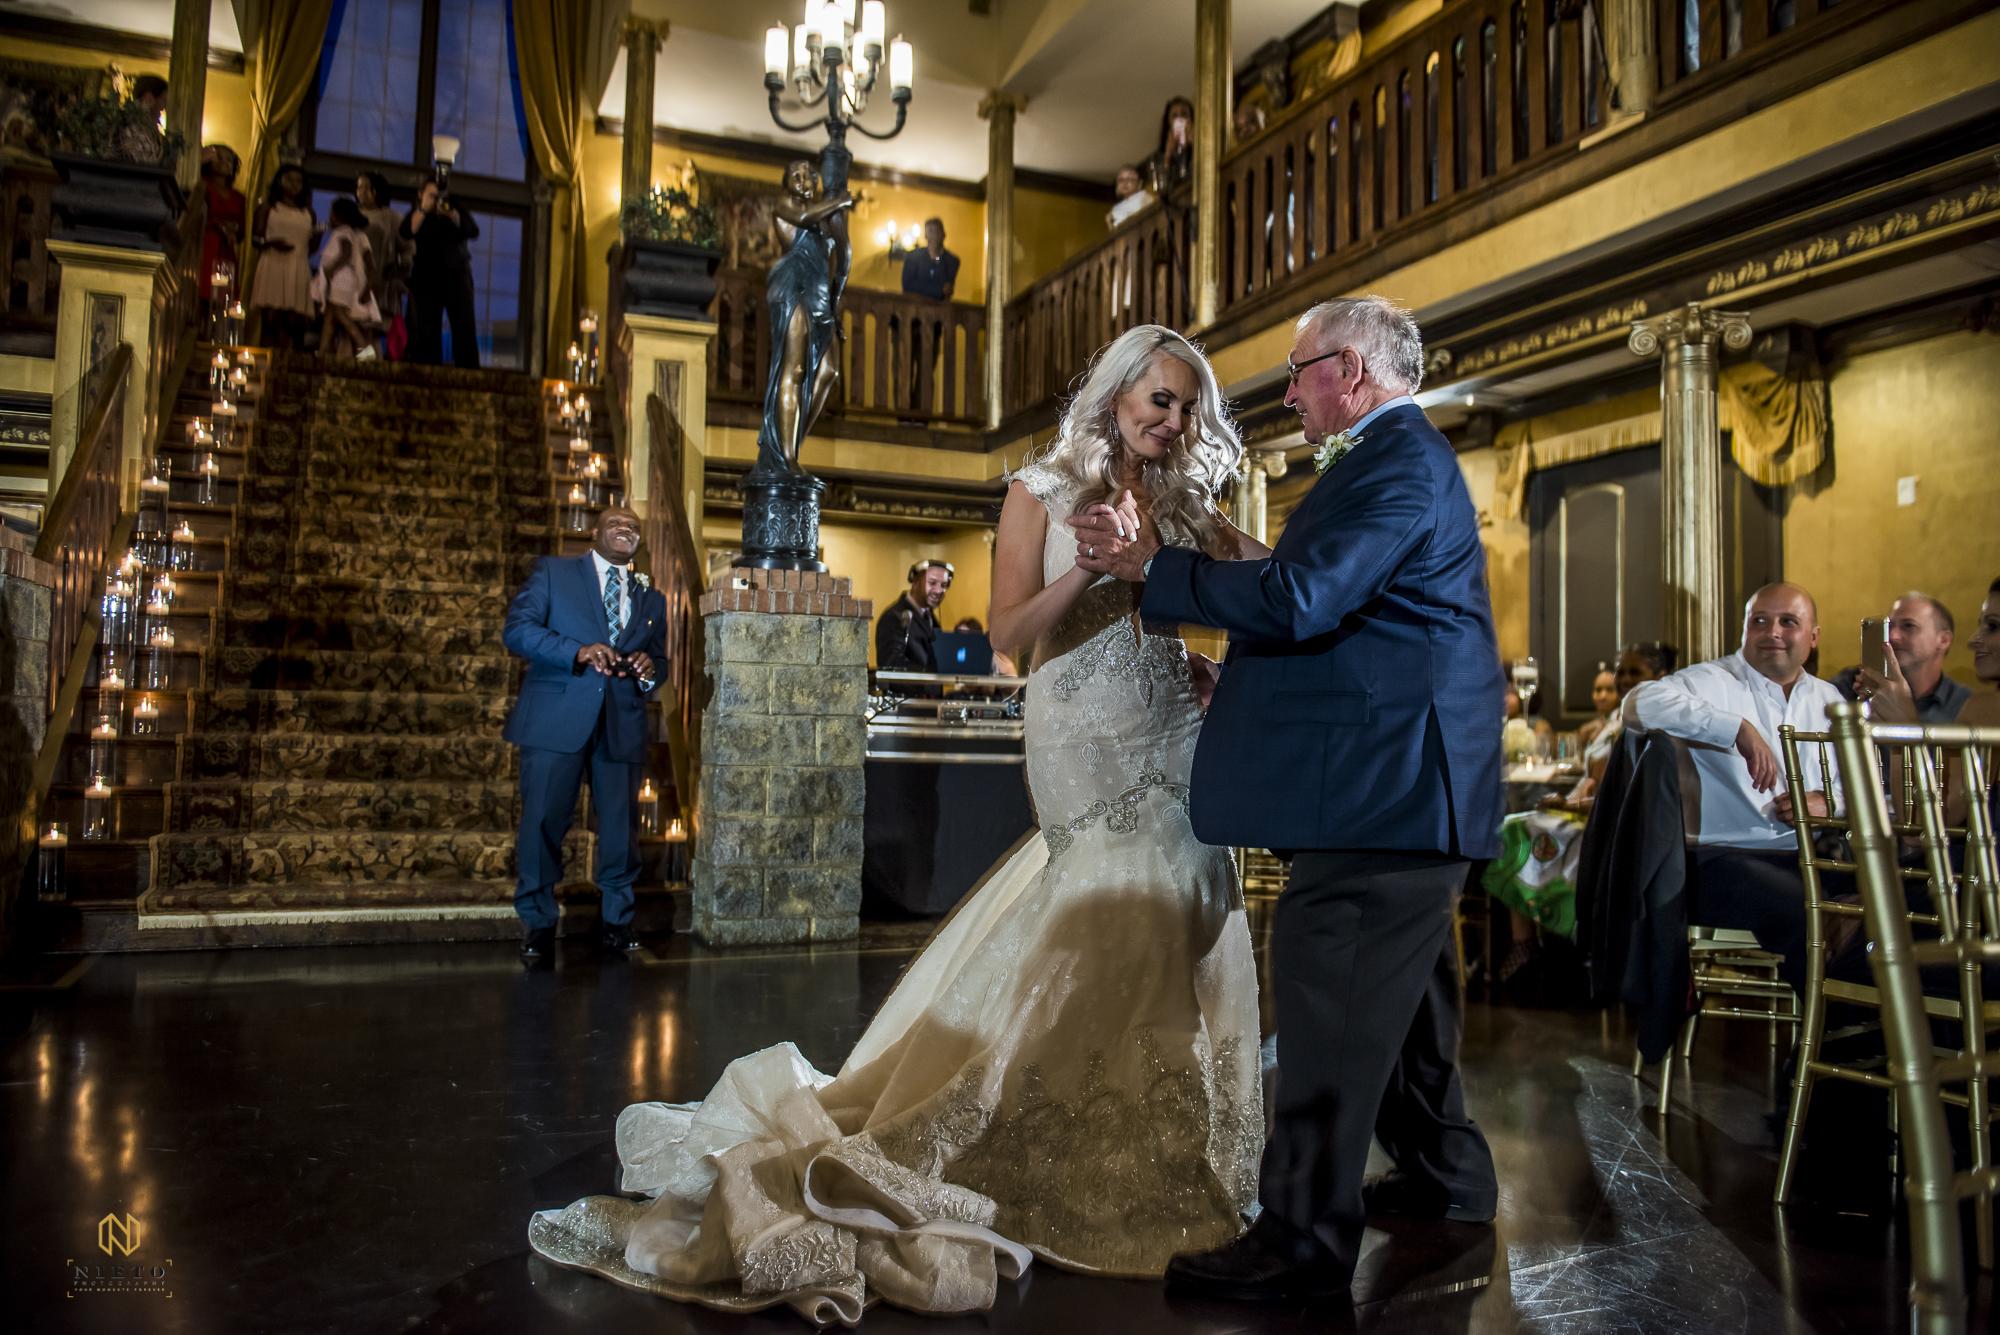 Barclay Villa Wedding - Tegran & Suzanne - 00593 Higgs - Fraites Nieto Photography.jpg